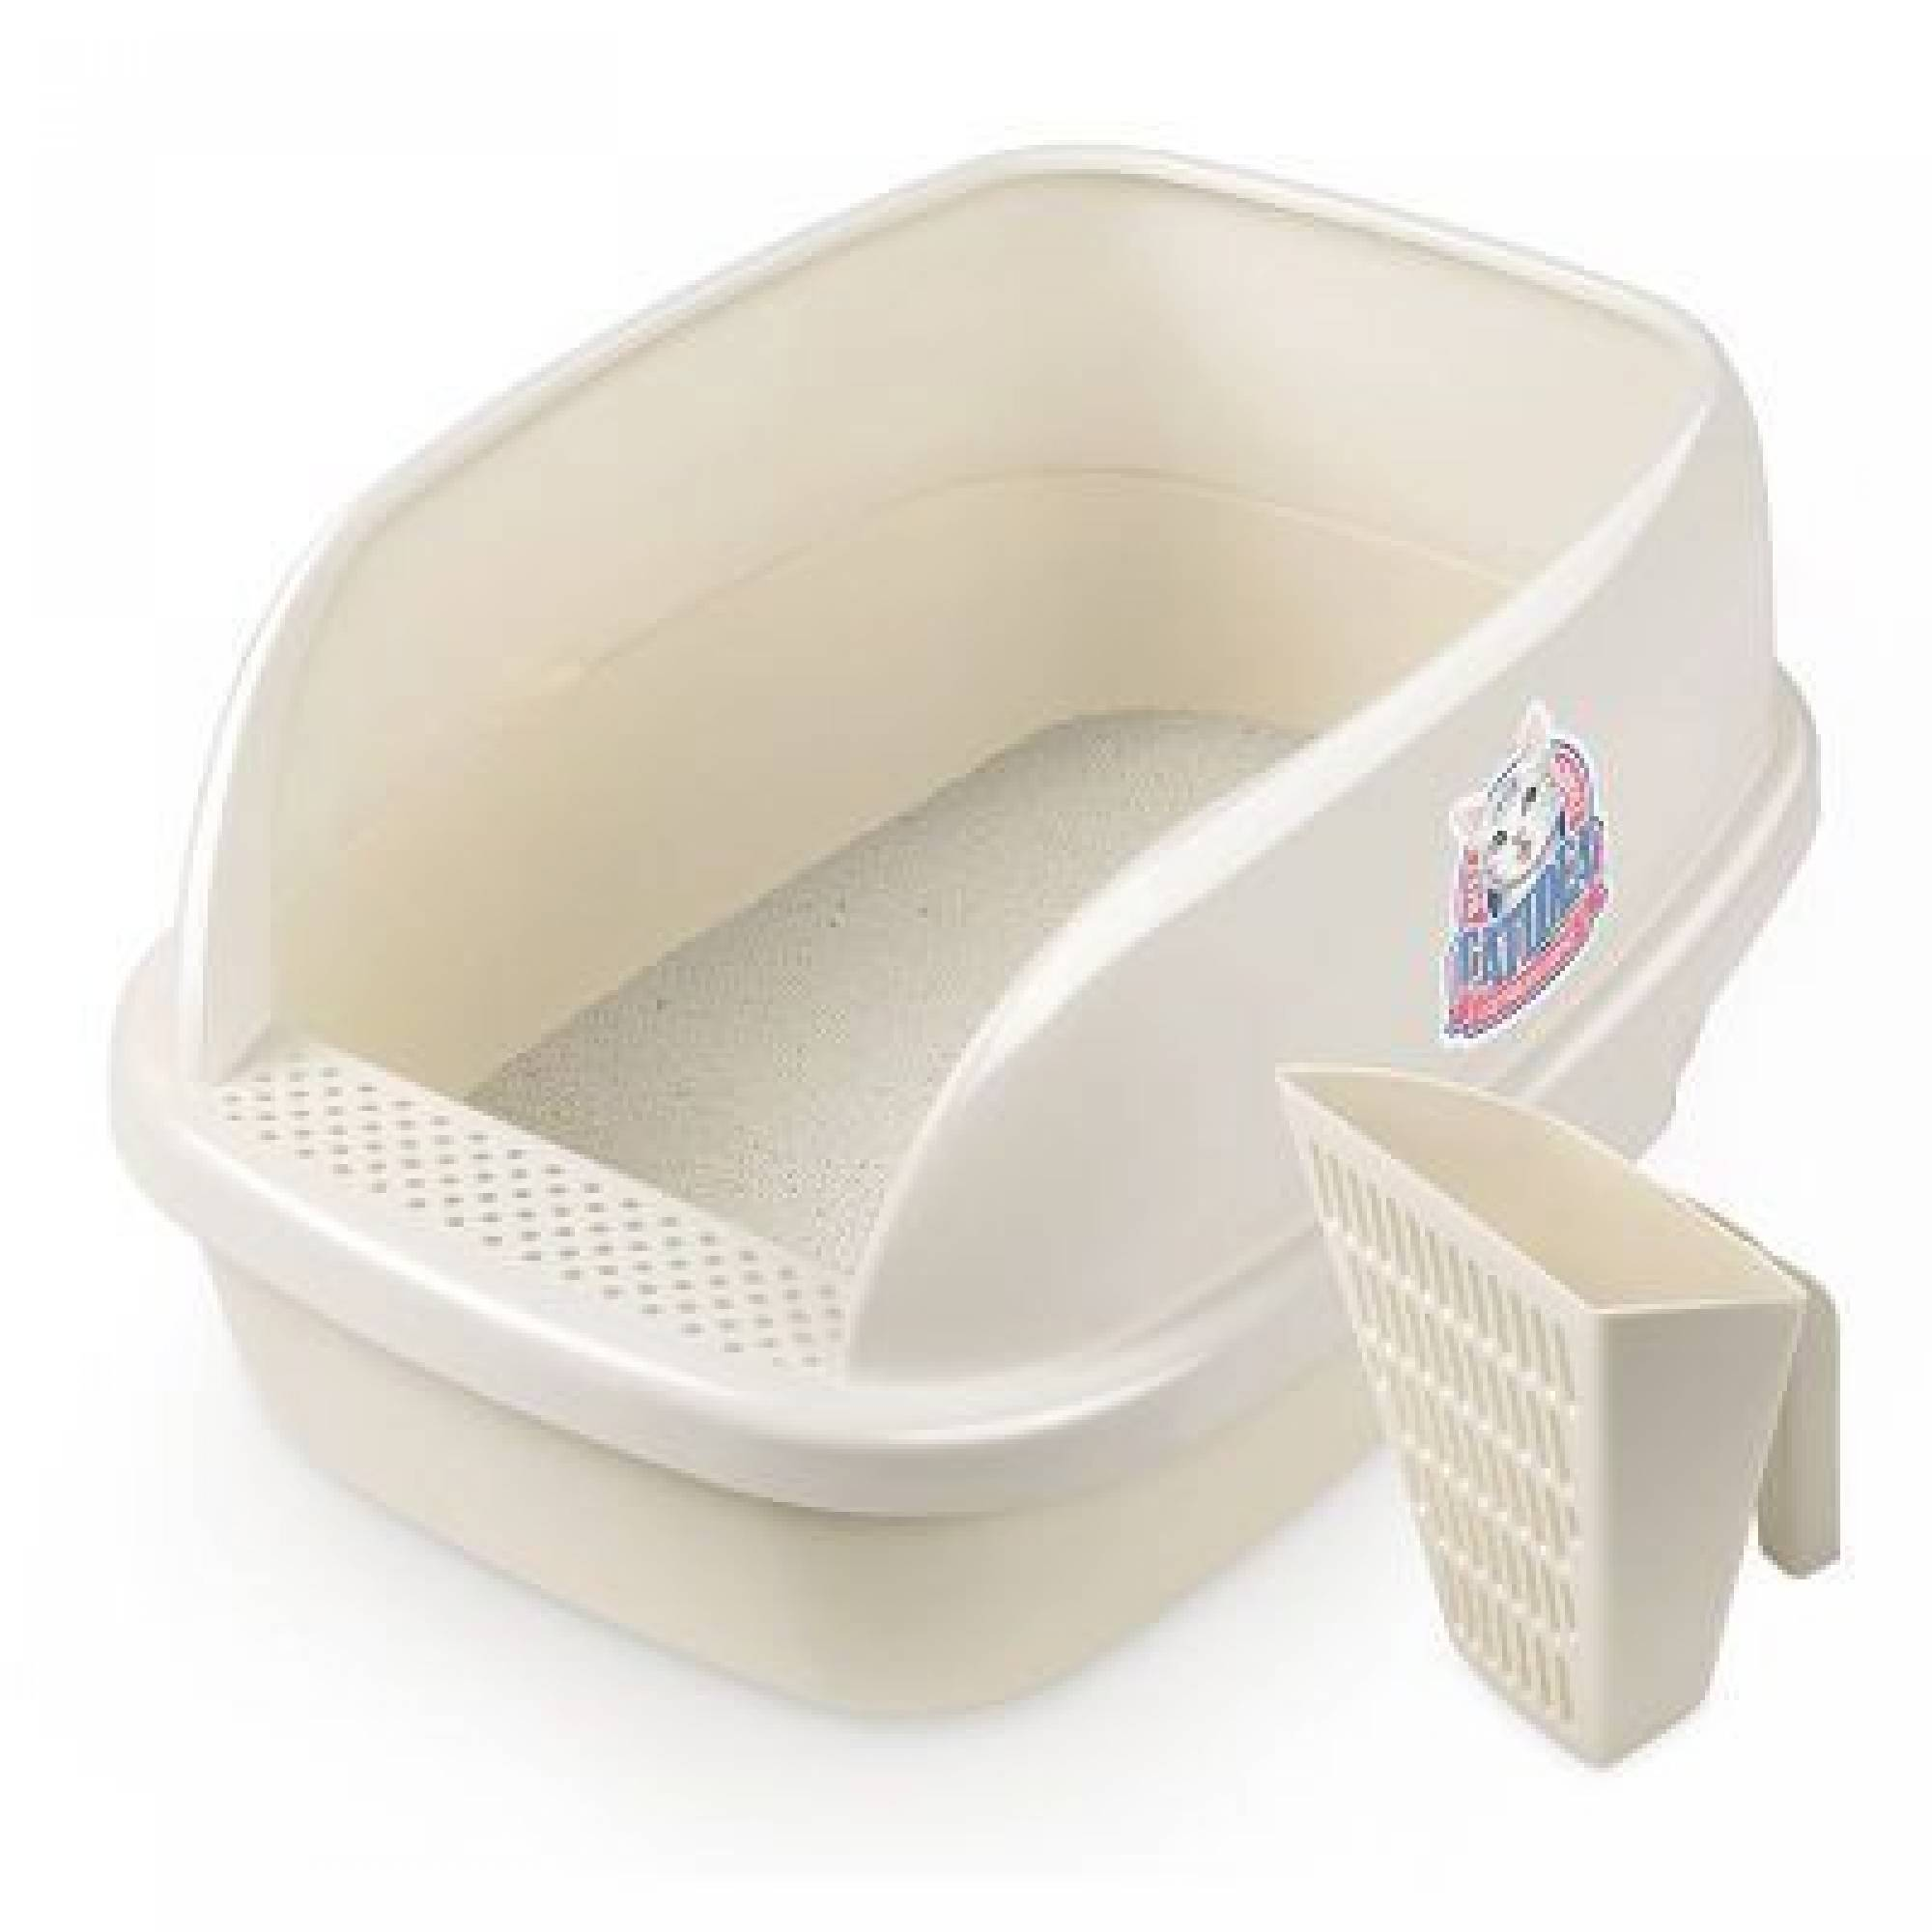 CATIDEA - CL211 Cat Litter XL Bread Cream with Scoop